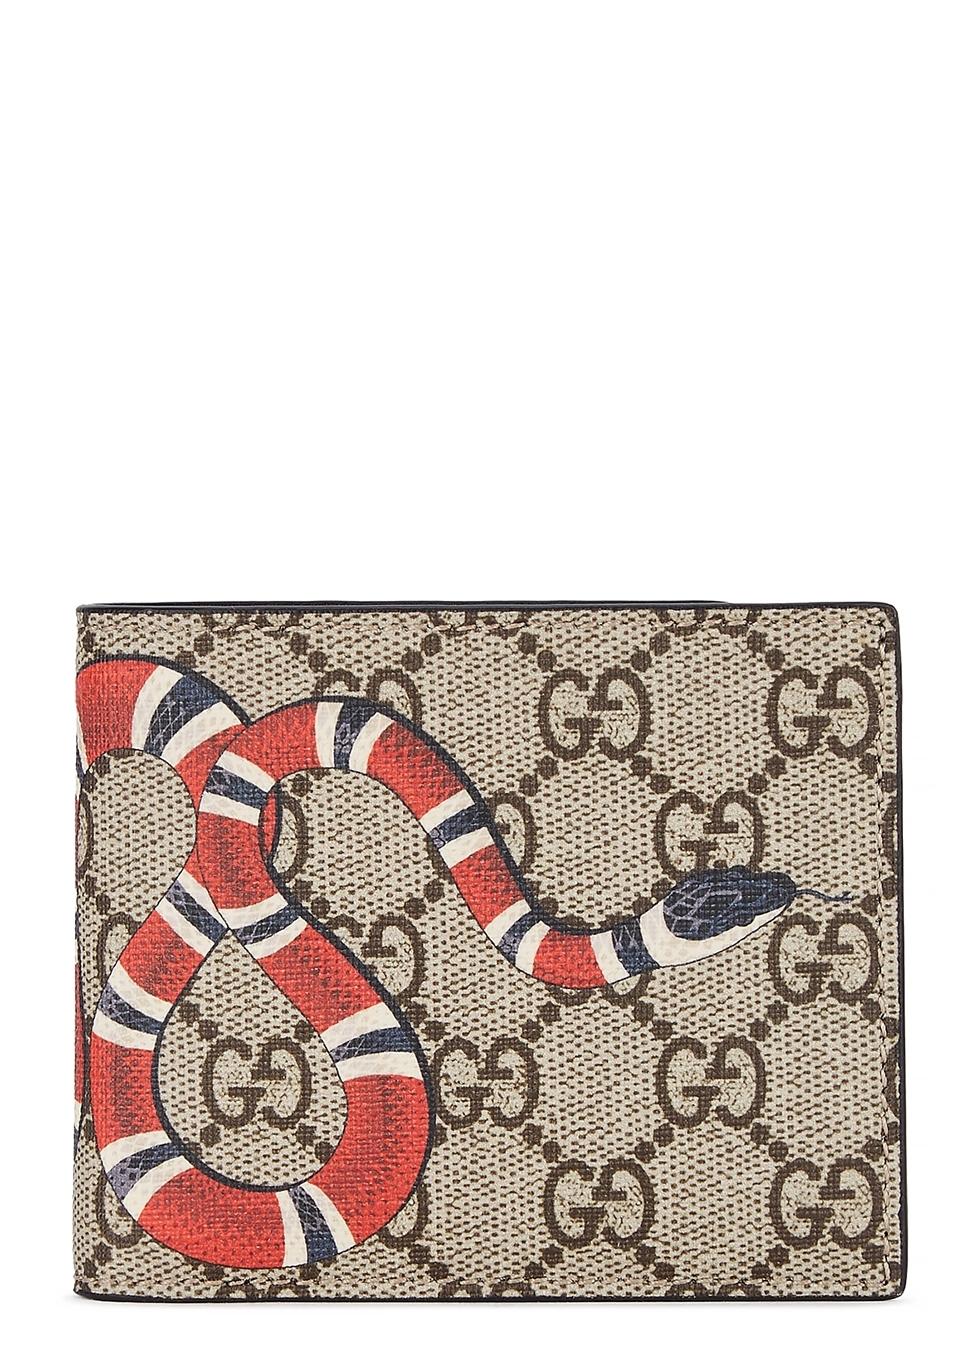 83a0e058ed Gucci - Harvey Nichols